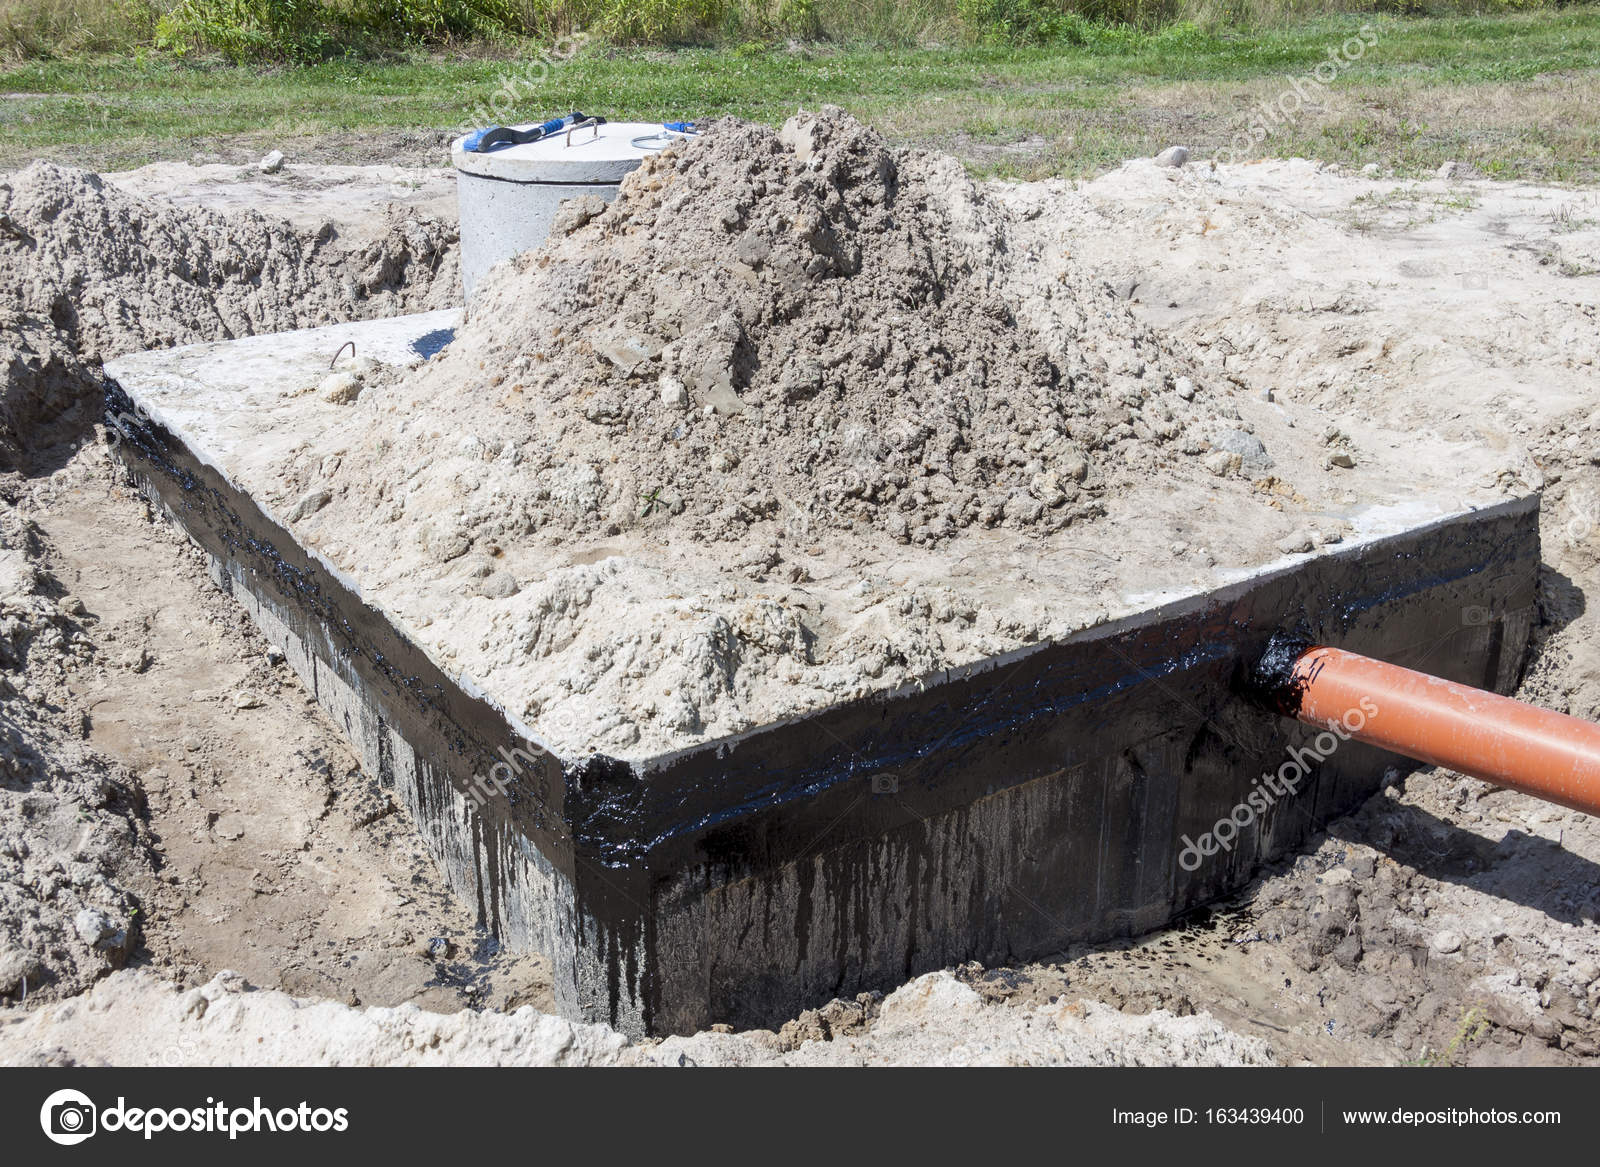 new concrete septic tank construction site photo by tomasz_parys